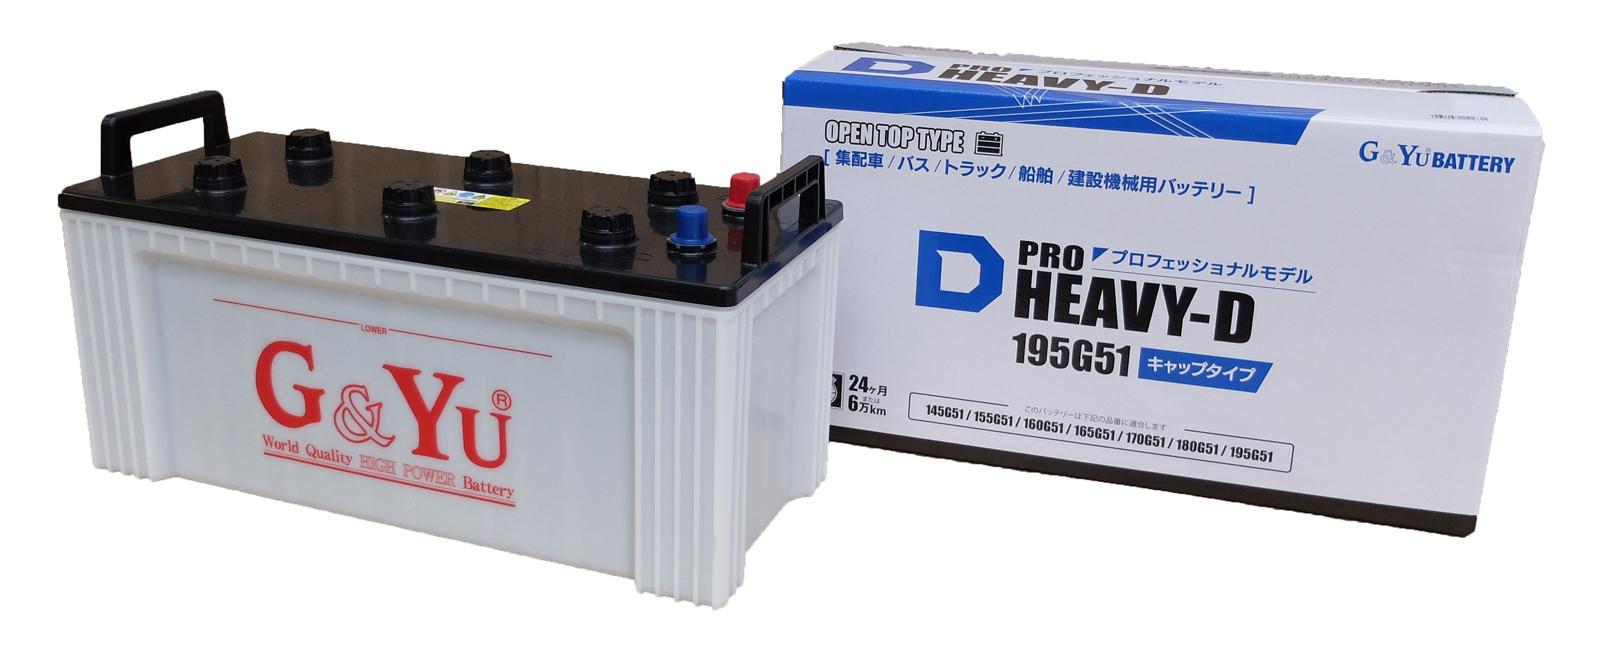 G&Yu バッテリー HD-195G51